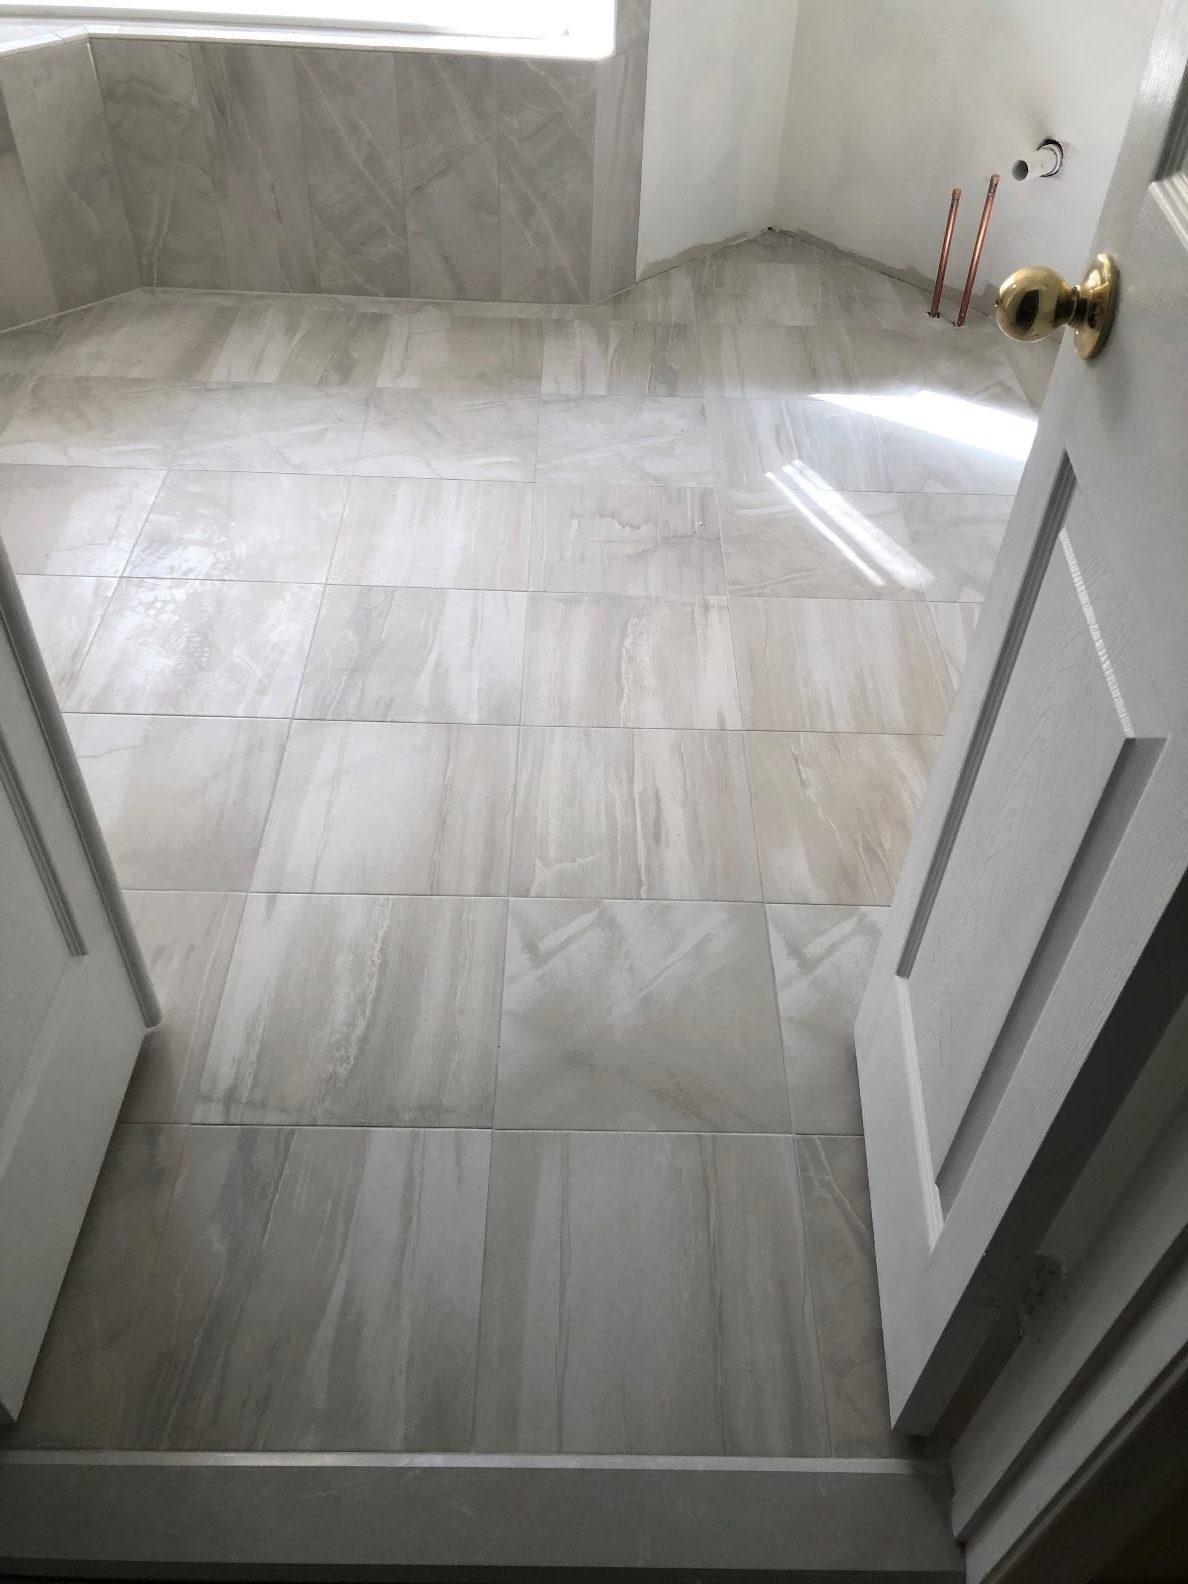 Bathroom finished flooring